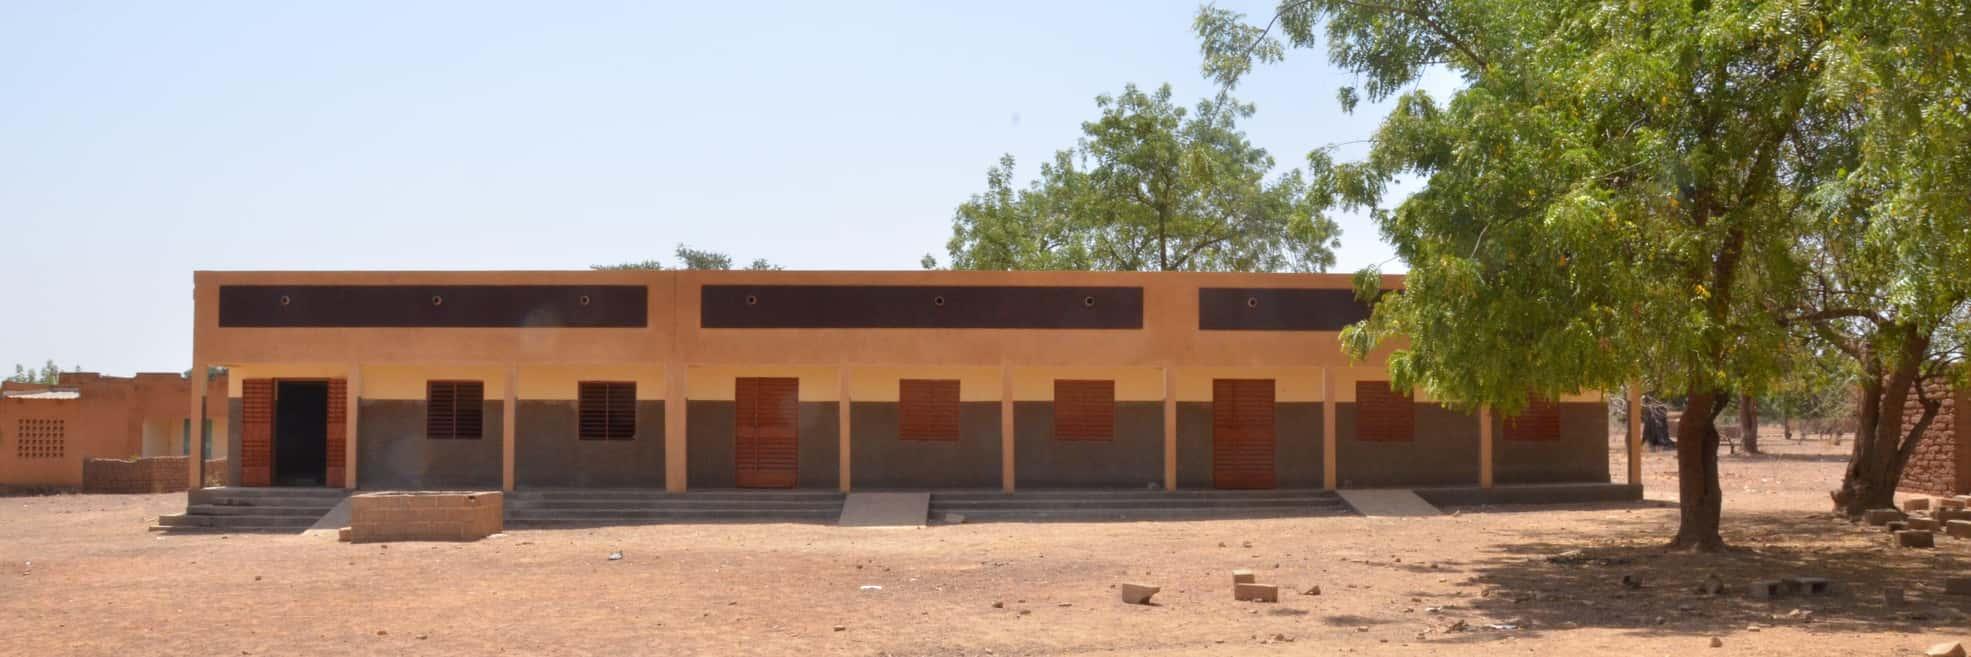 Photo bâtiment